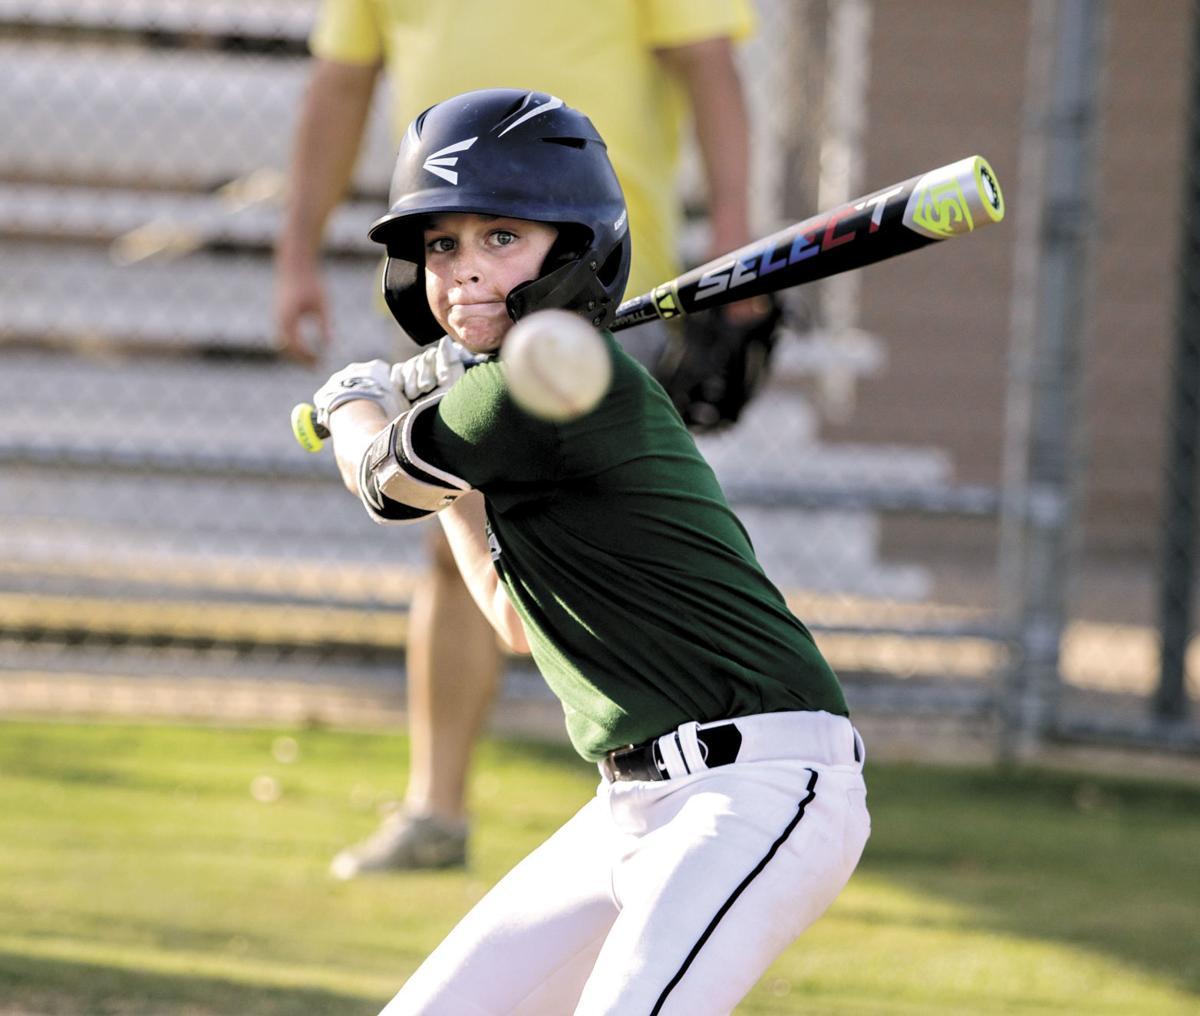 Washington County Little League Minor All-Star Hunter Myers